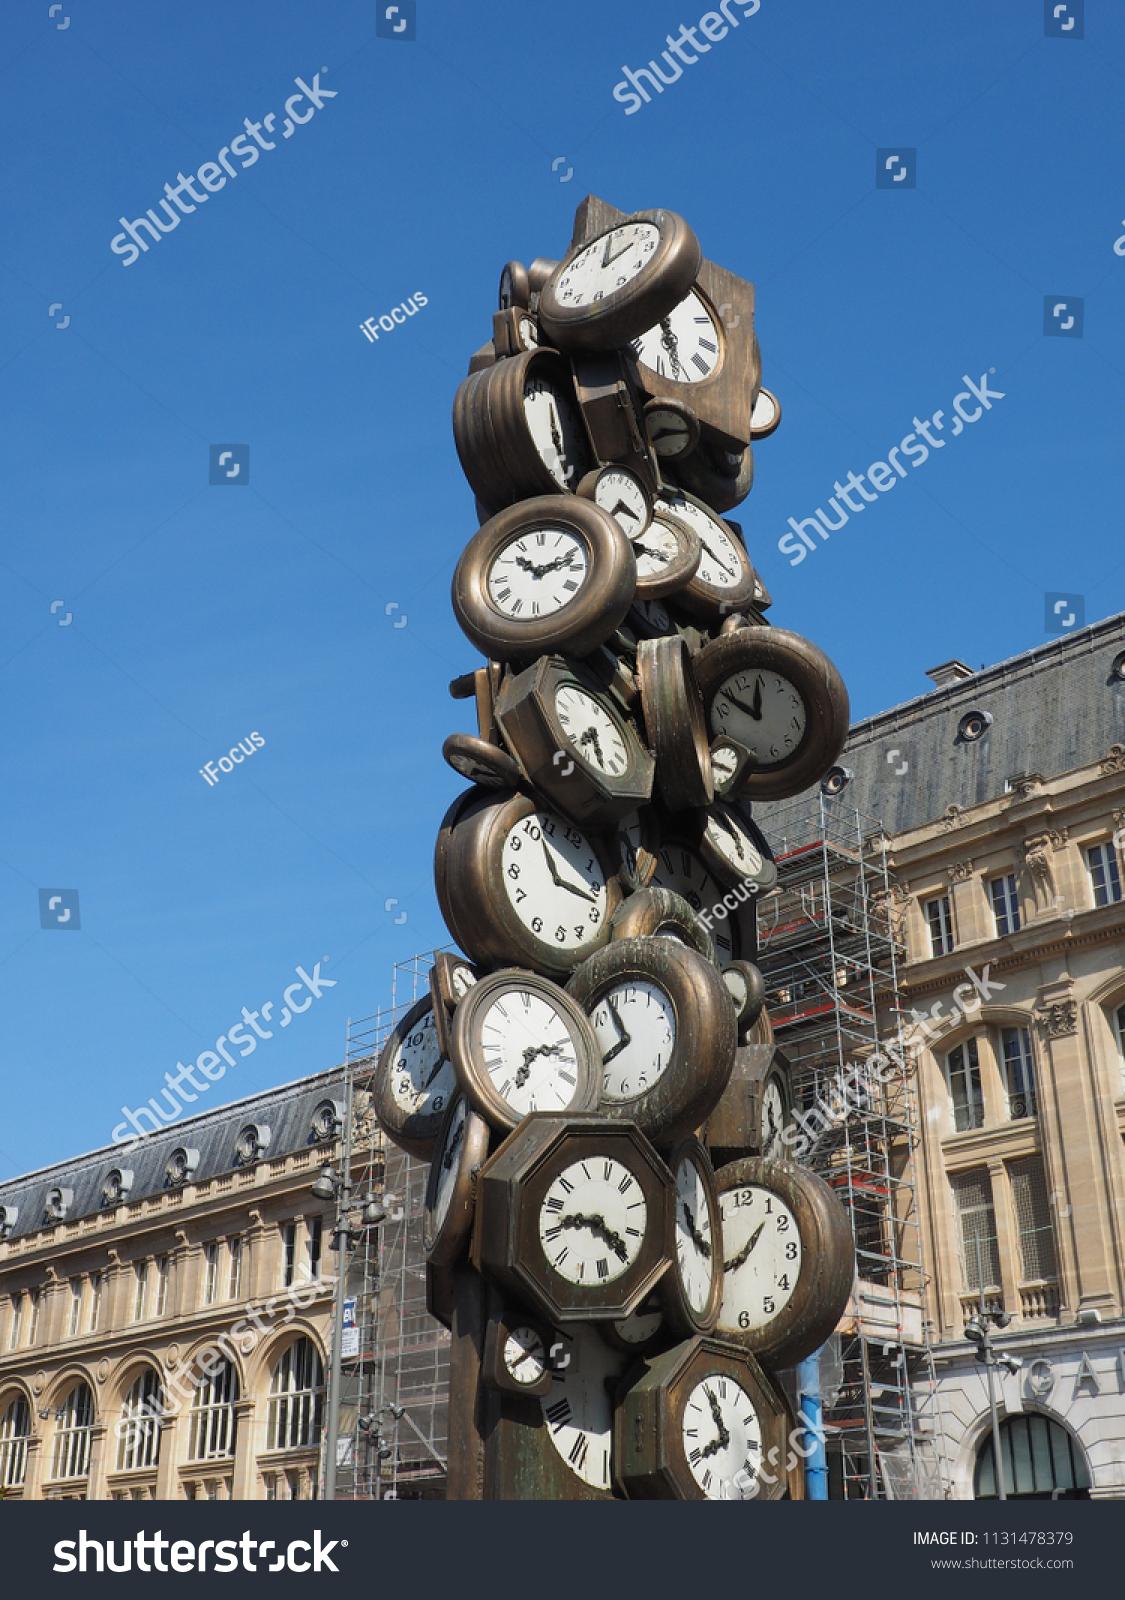 "PARIS, FRANCE - JULY 10. 2018: Arman Fernandez' sculpture ""L'heure de tous"" soars into blue sky in front of St-Lazare railway station on July 10, 2018 in Paris, France."